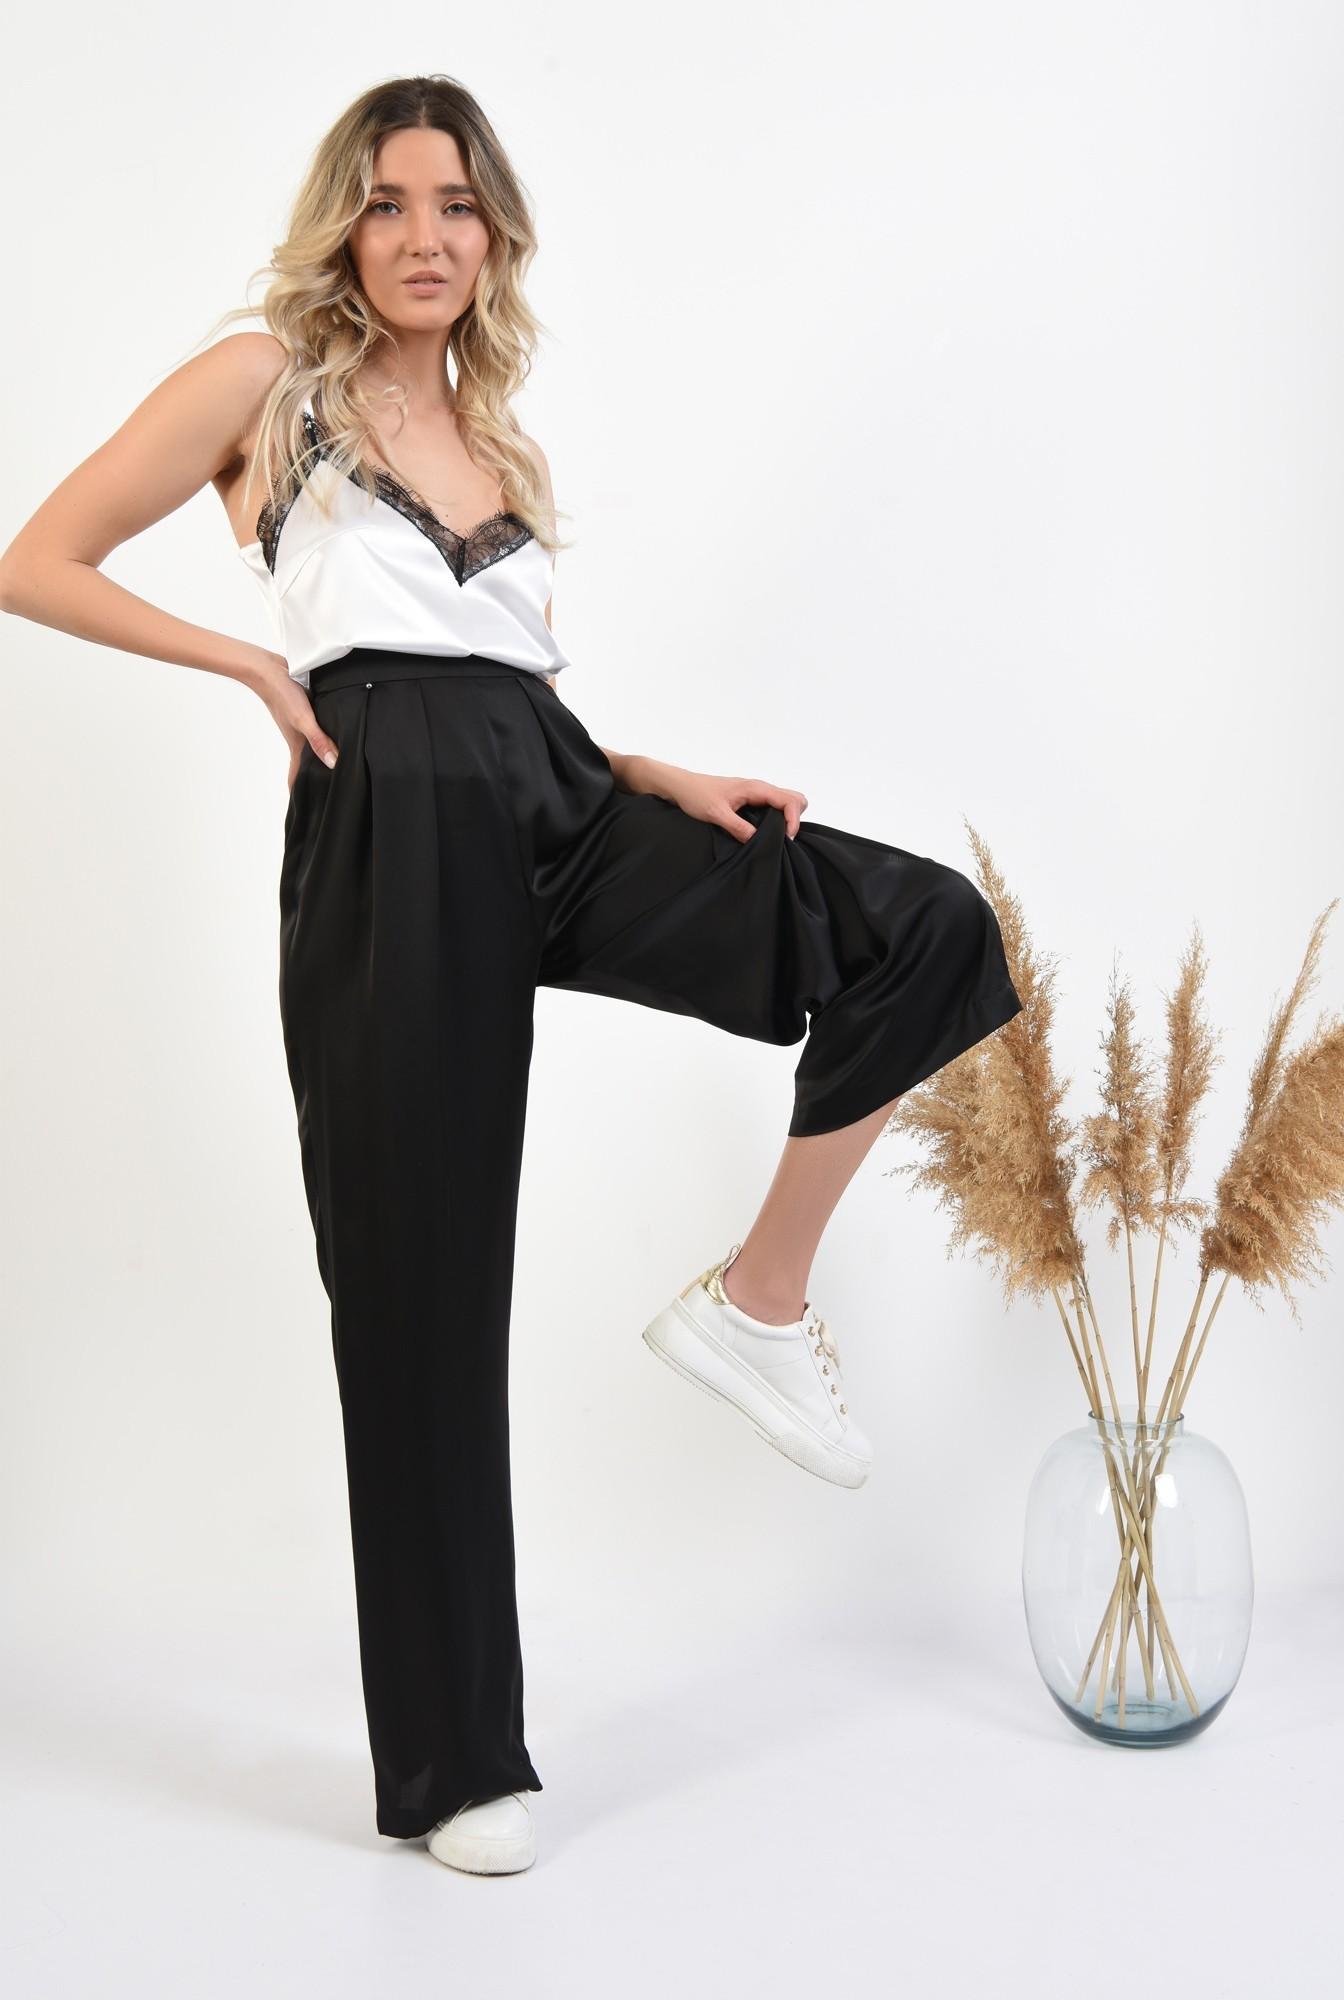 0 - pantaloni eleganti, evazati, cu pliuri, talie inalta, pantaloni de ocazie